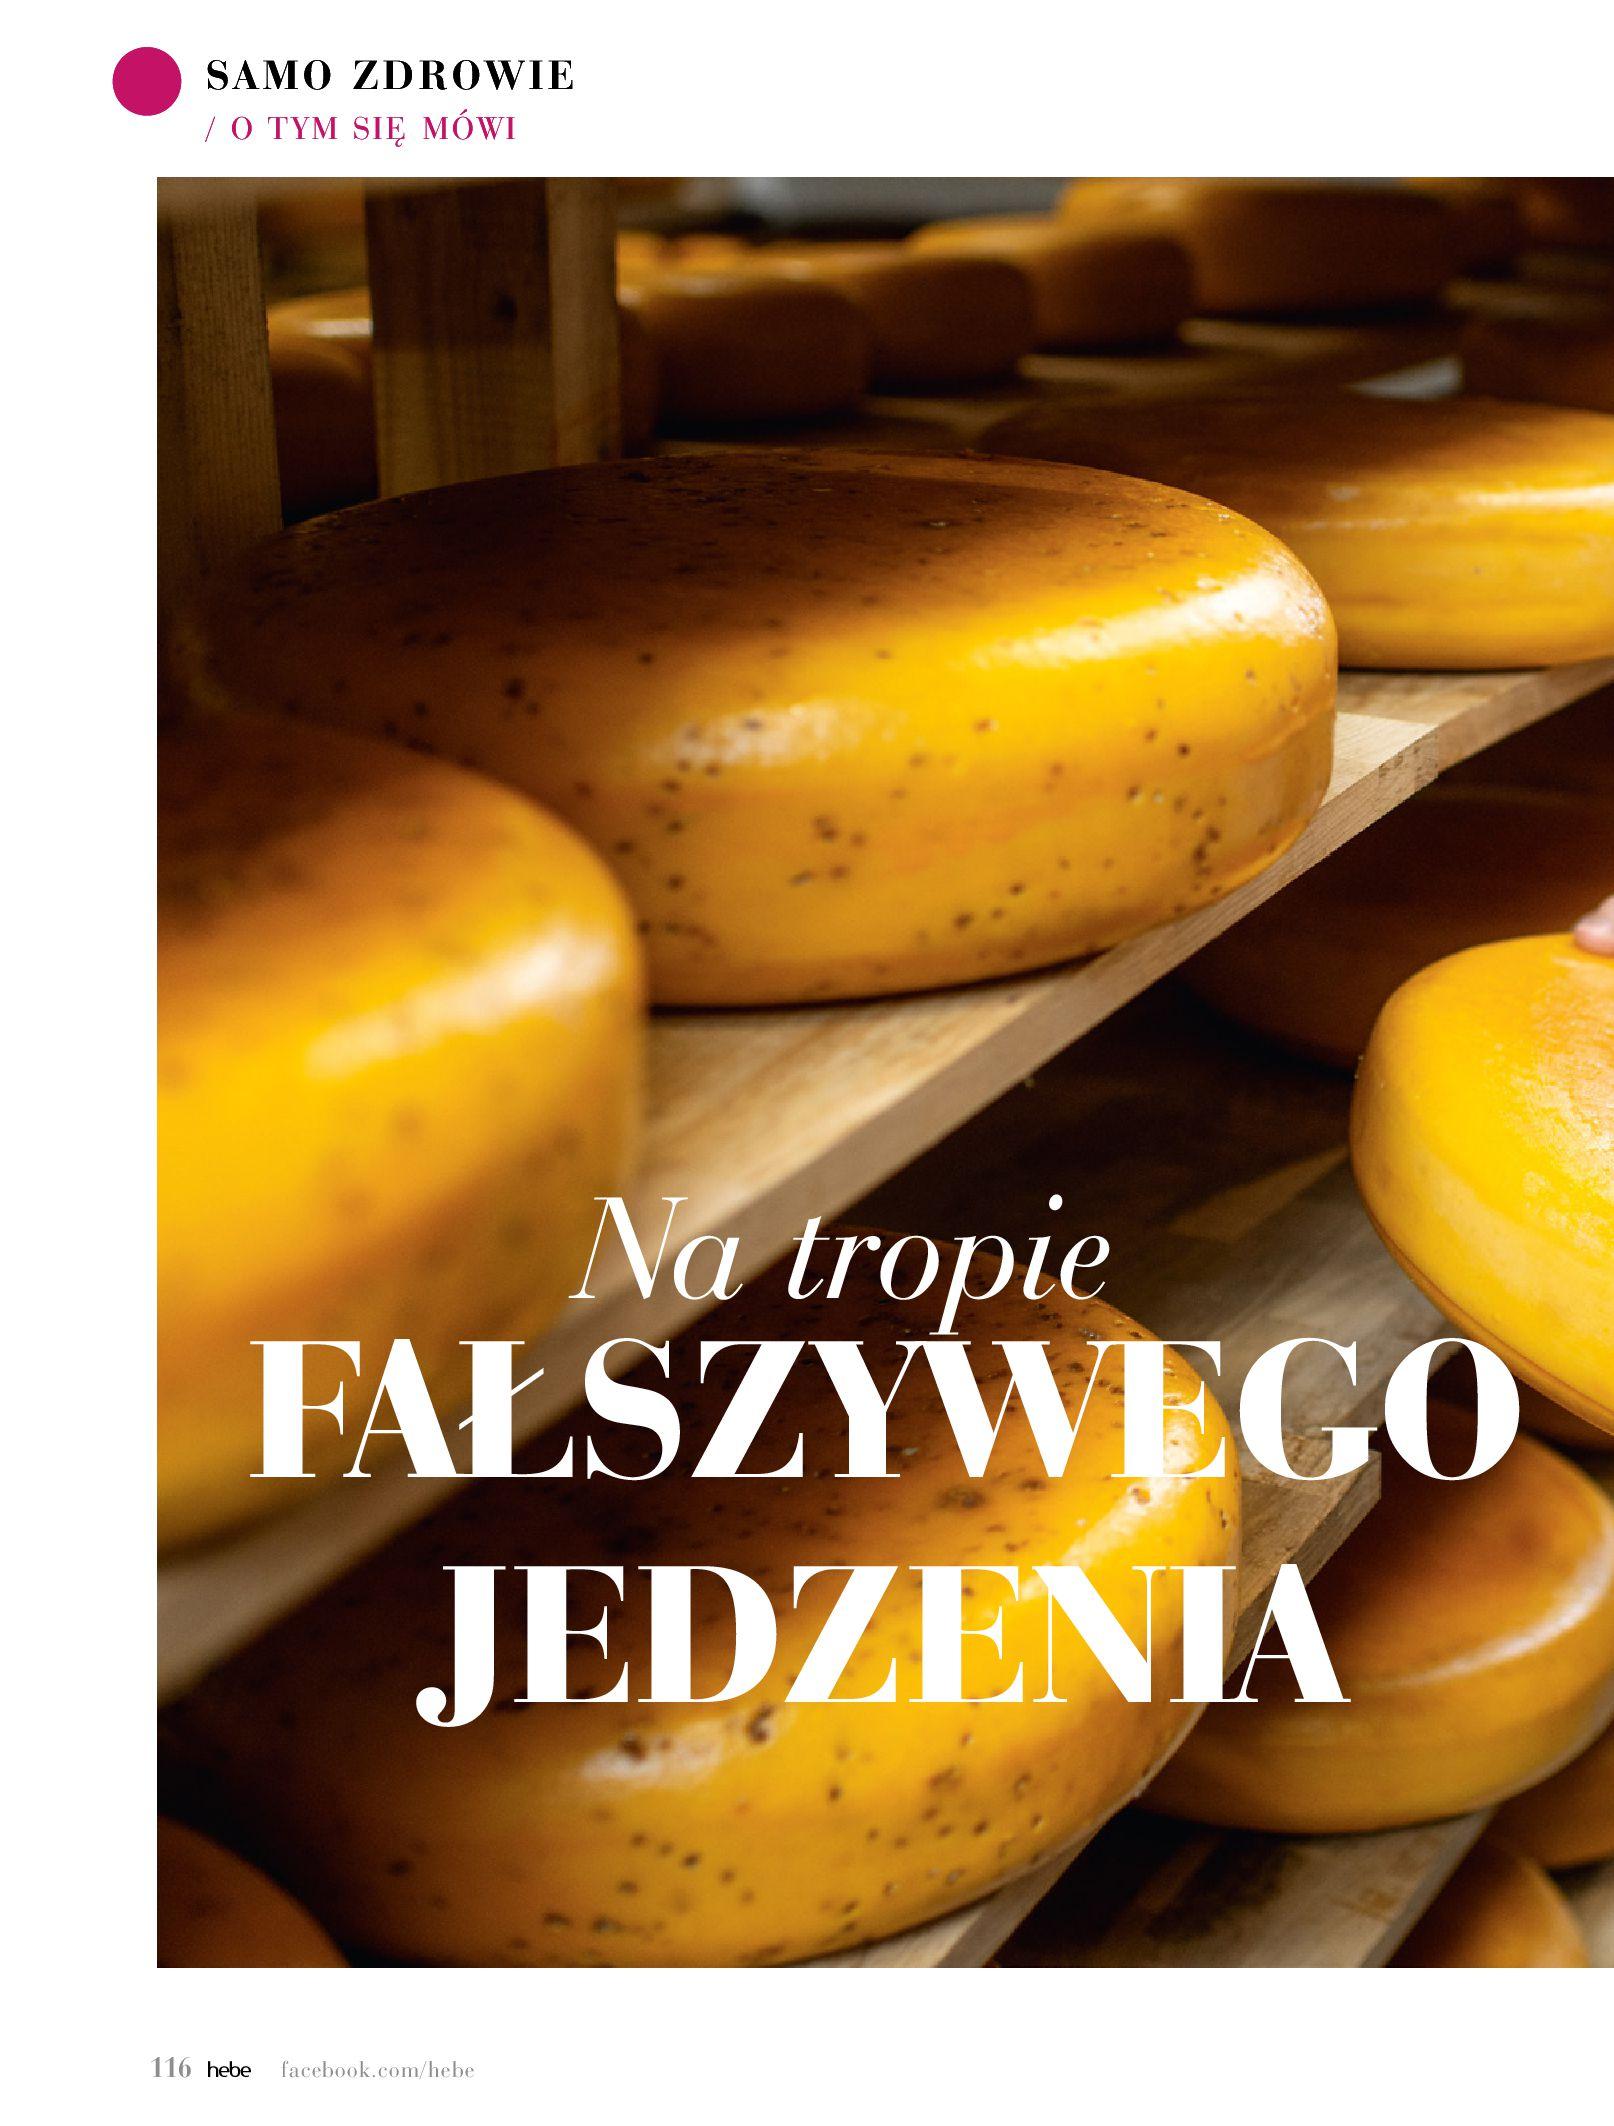 Gazetka hebe: Magazyn Hebe - Trendy na lato 2021-07-01 page-116